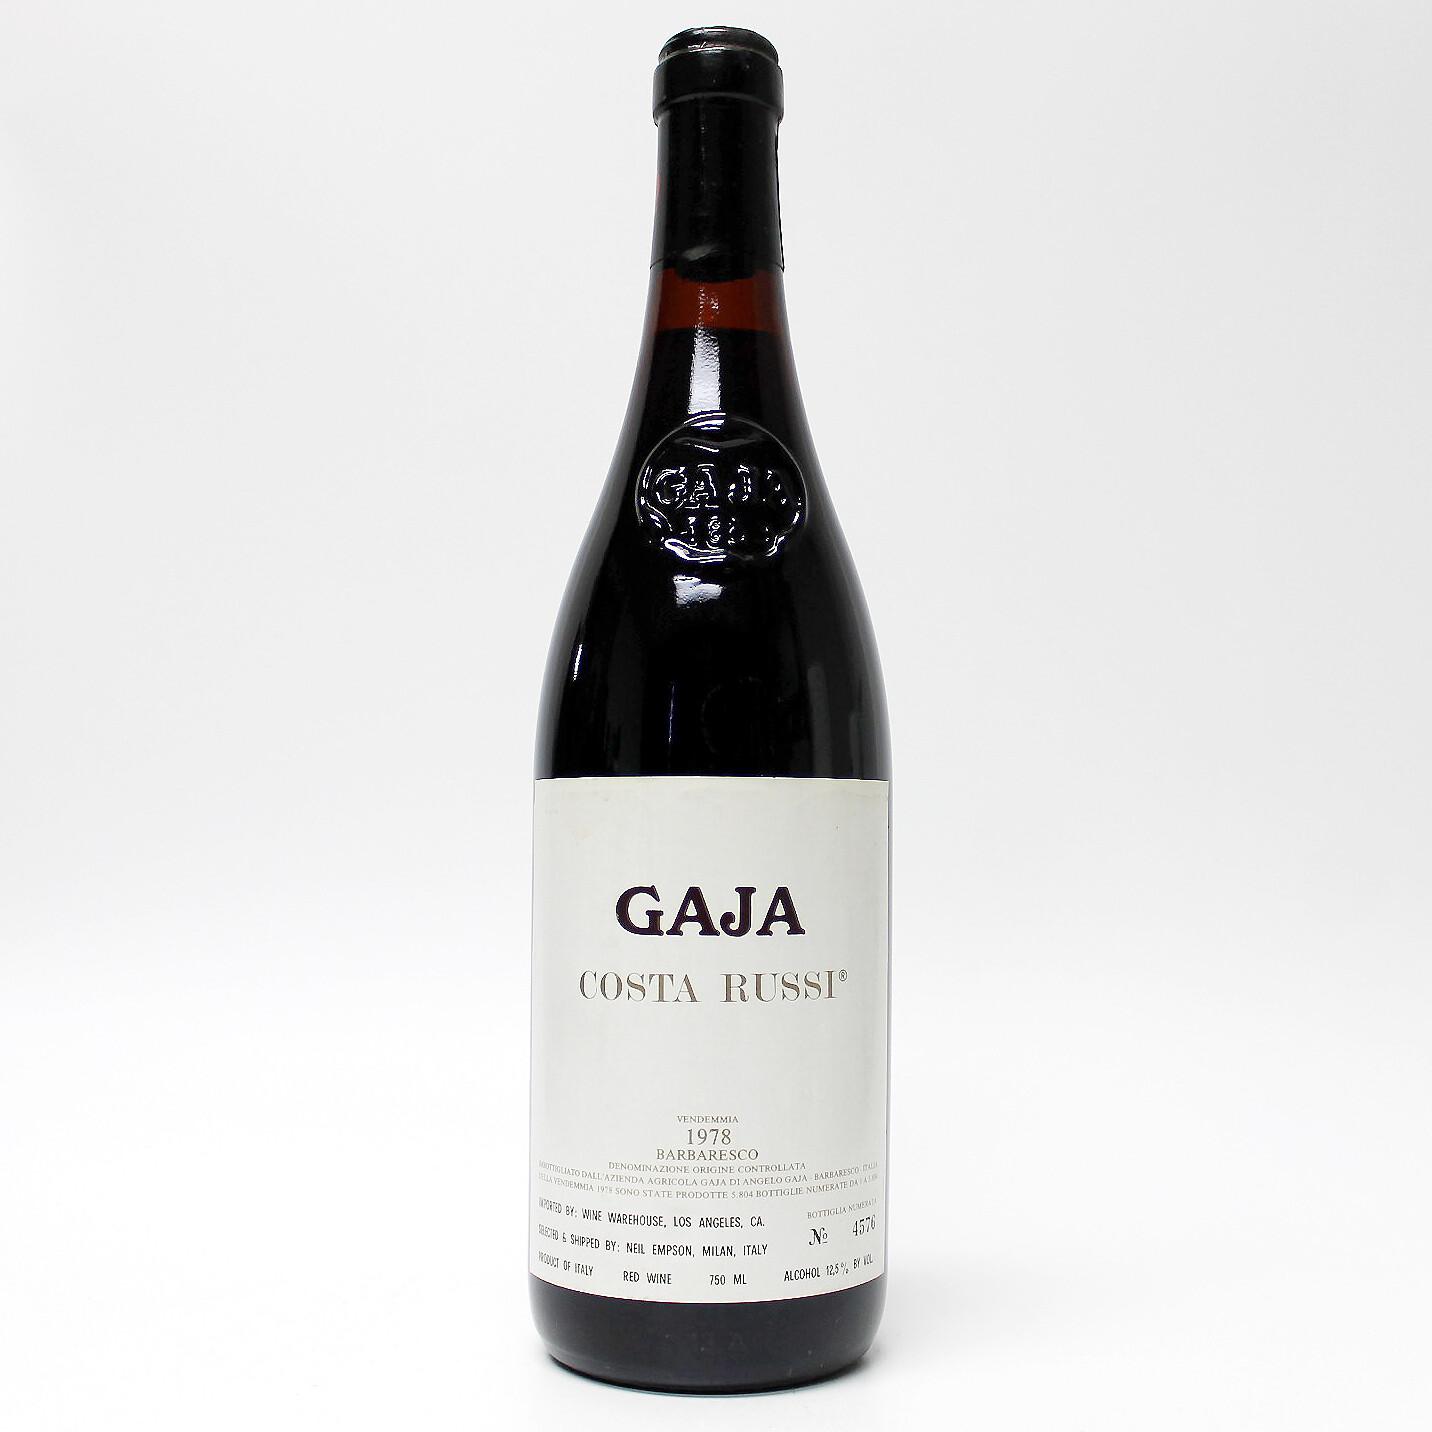 Gaja Costa Russi Langhe-Barbaresco, Piedmont 2014 (750 ml)